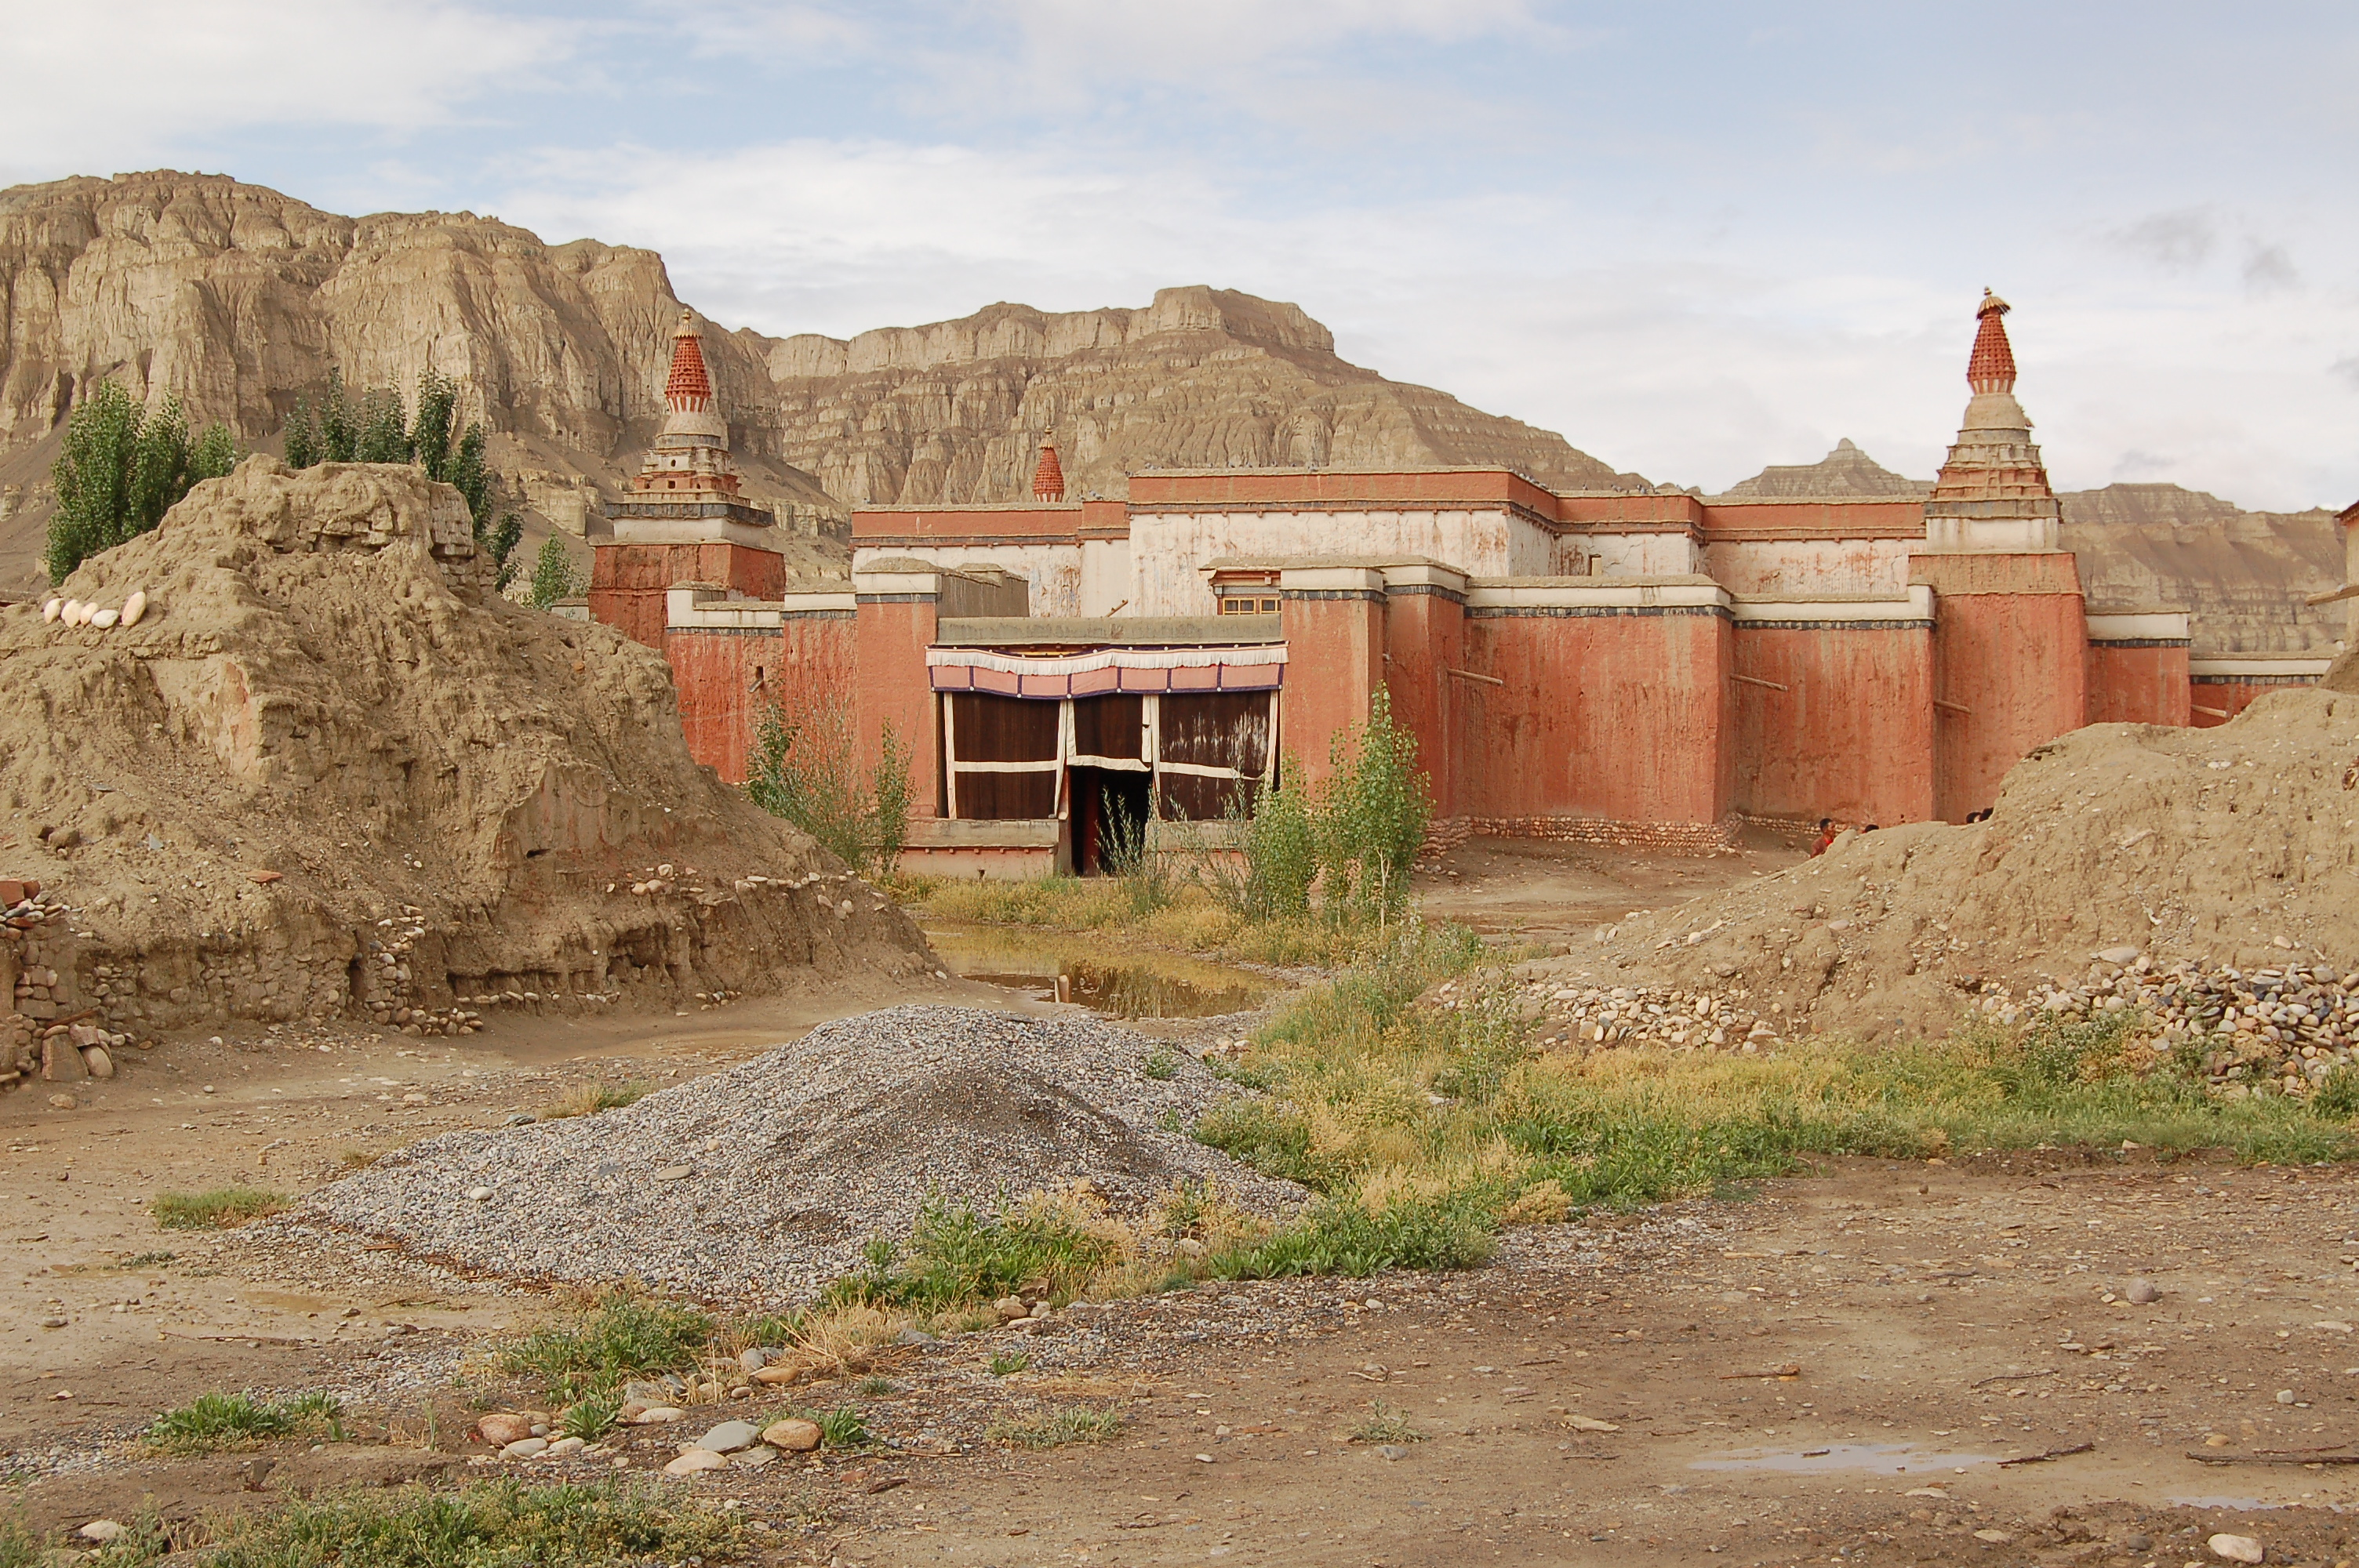 san francisco 37a0d 50553 File:Tholing-Kloster (Tibet) Roter Tempel Dieter Schuh.JPG ...